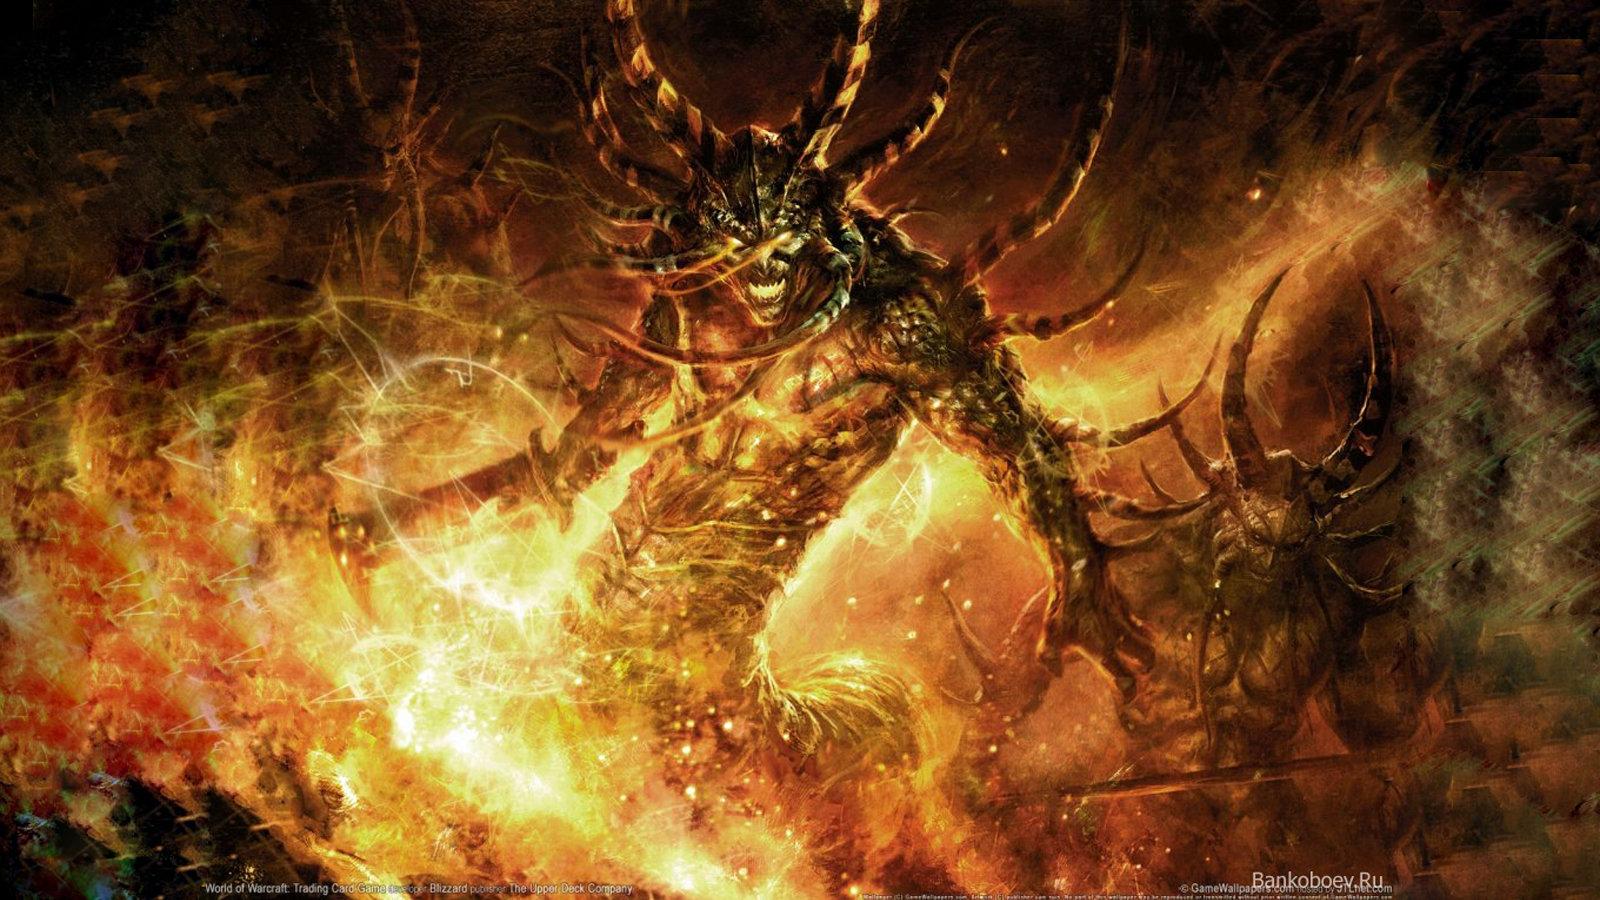 World Of Warcraft (WOW) Wallpapers 1600x900 Desktop